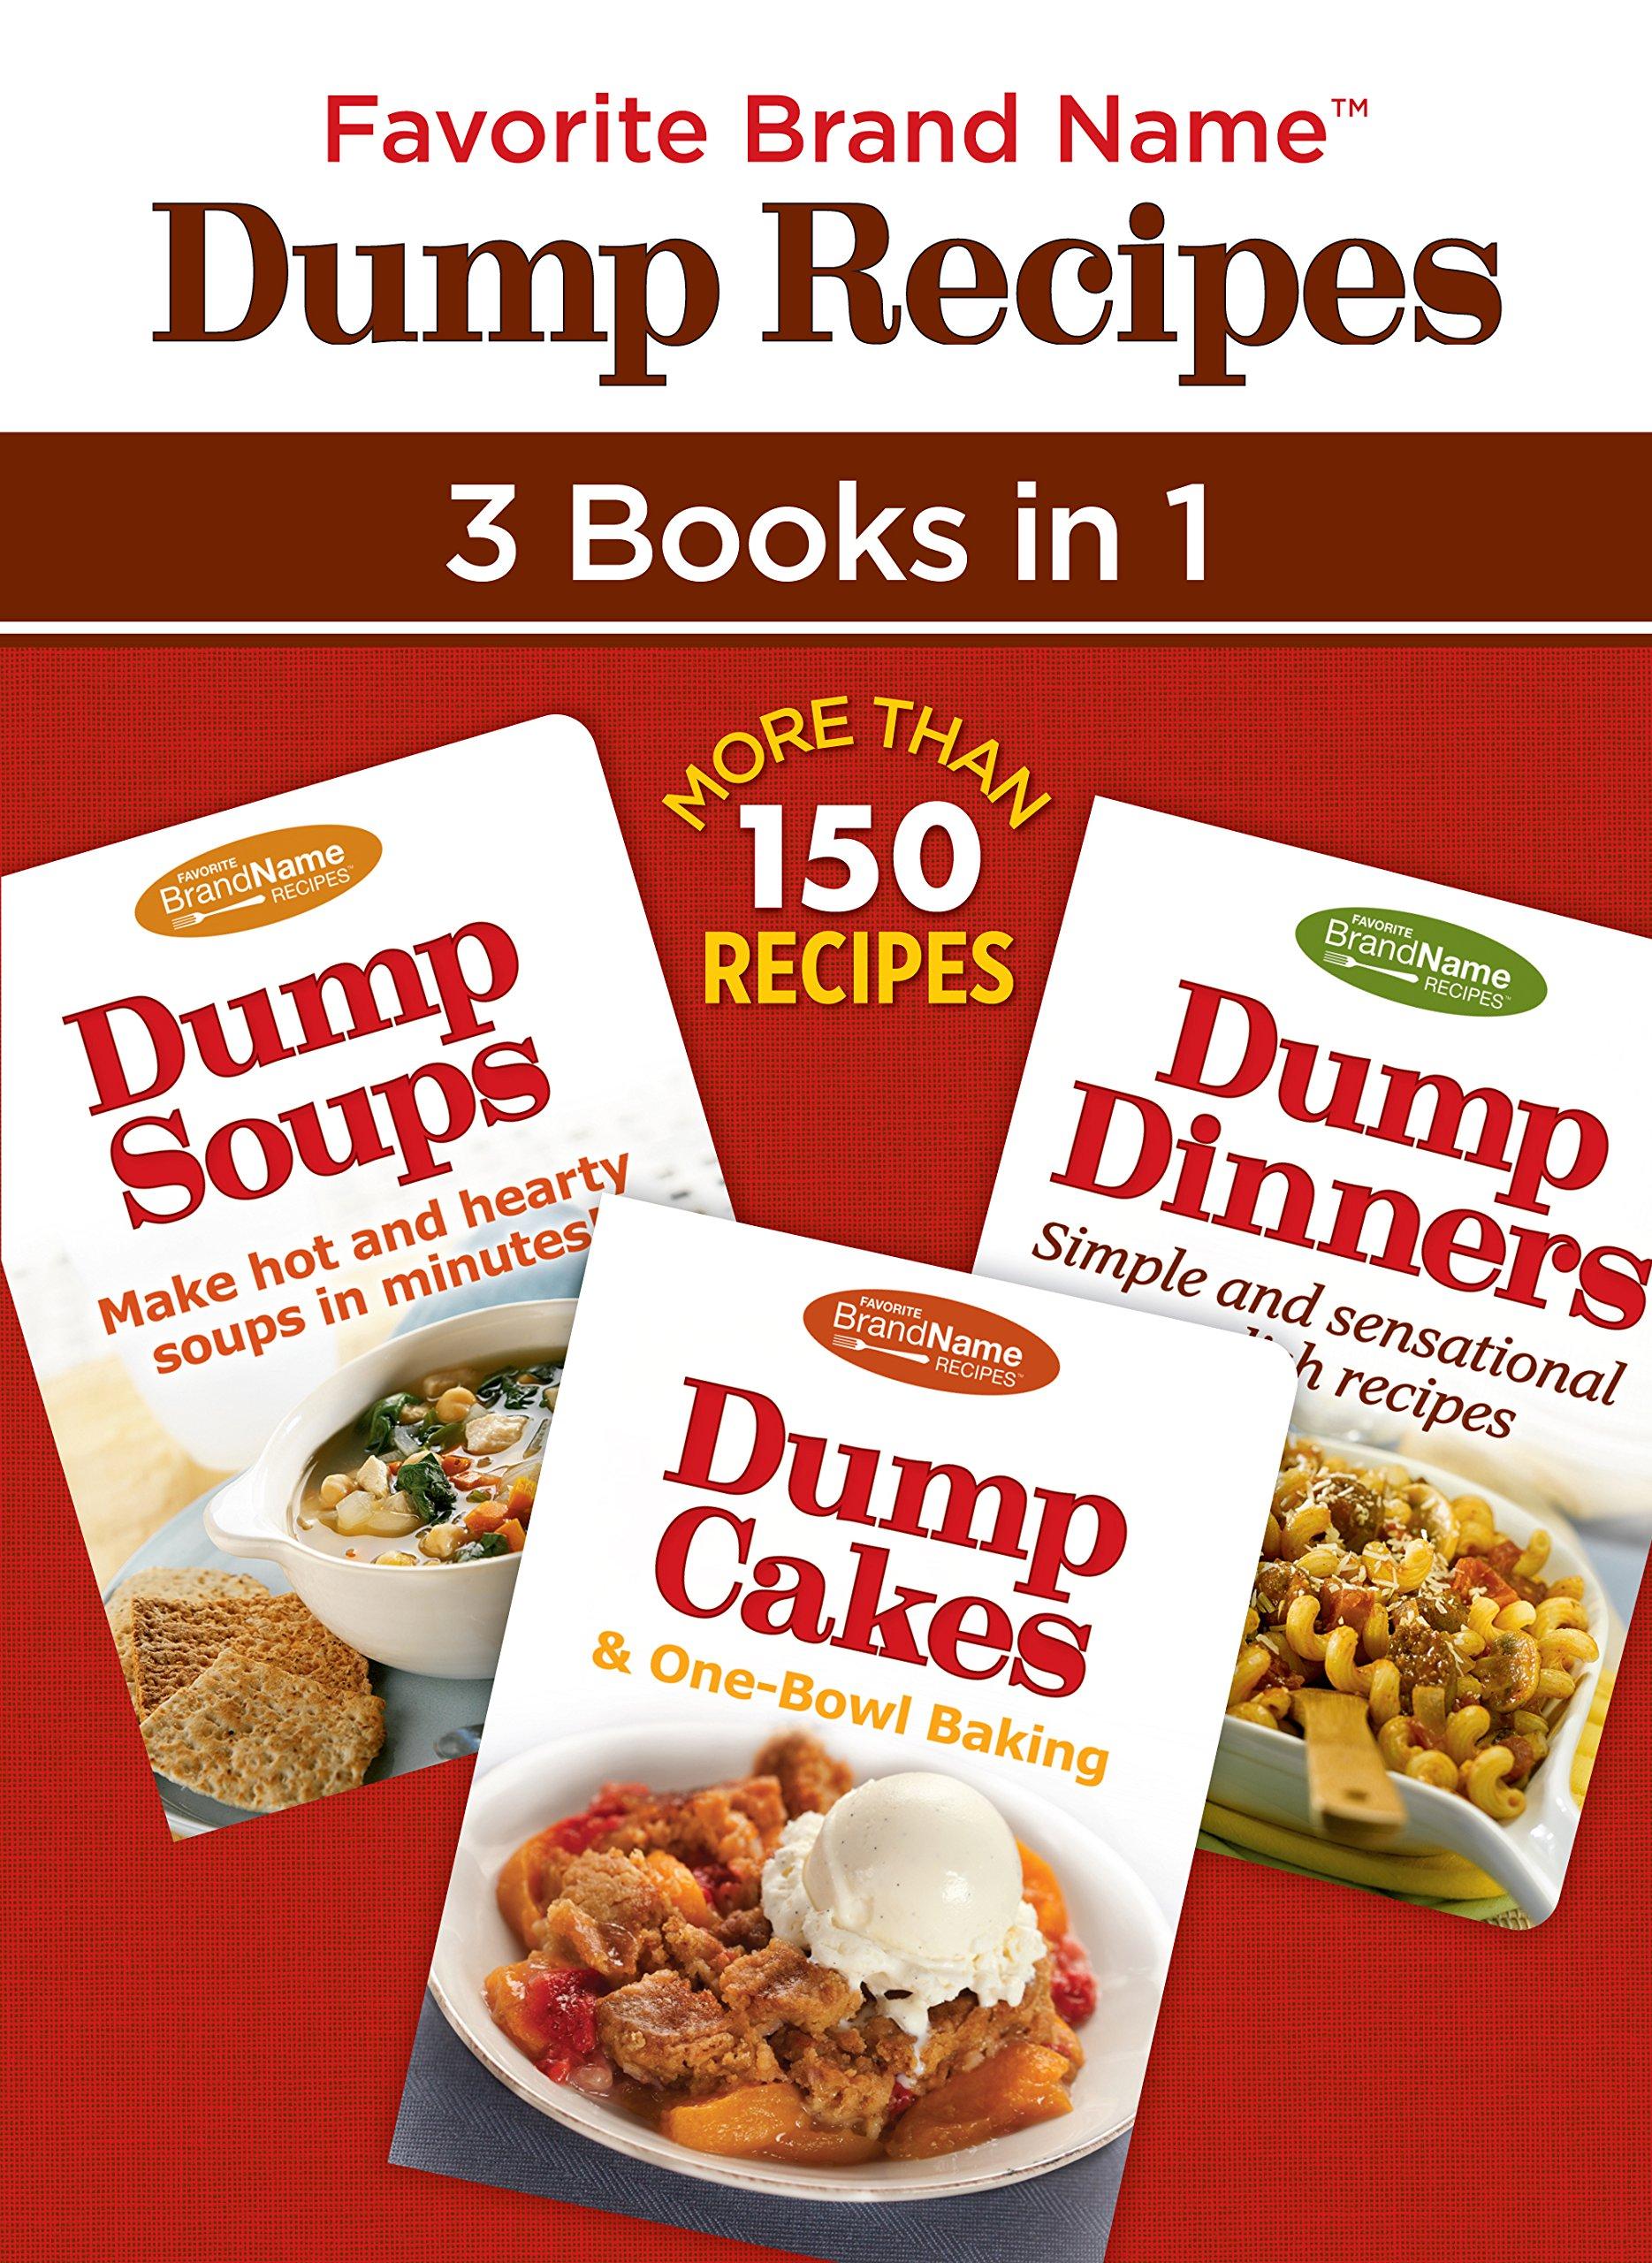 Favorite Brand Name Dump Recipes product image